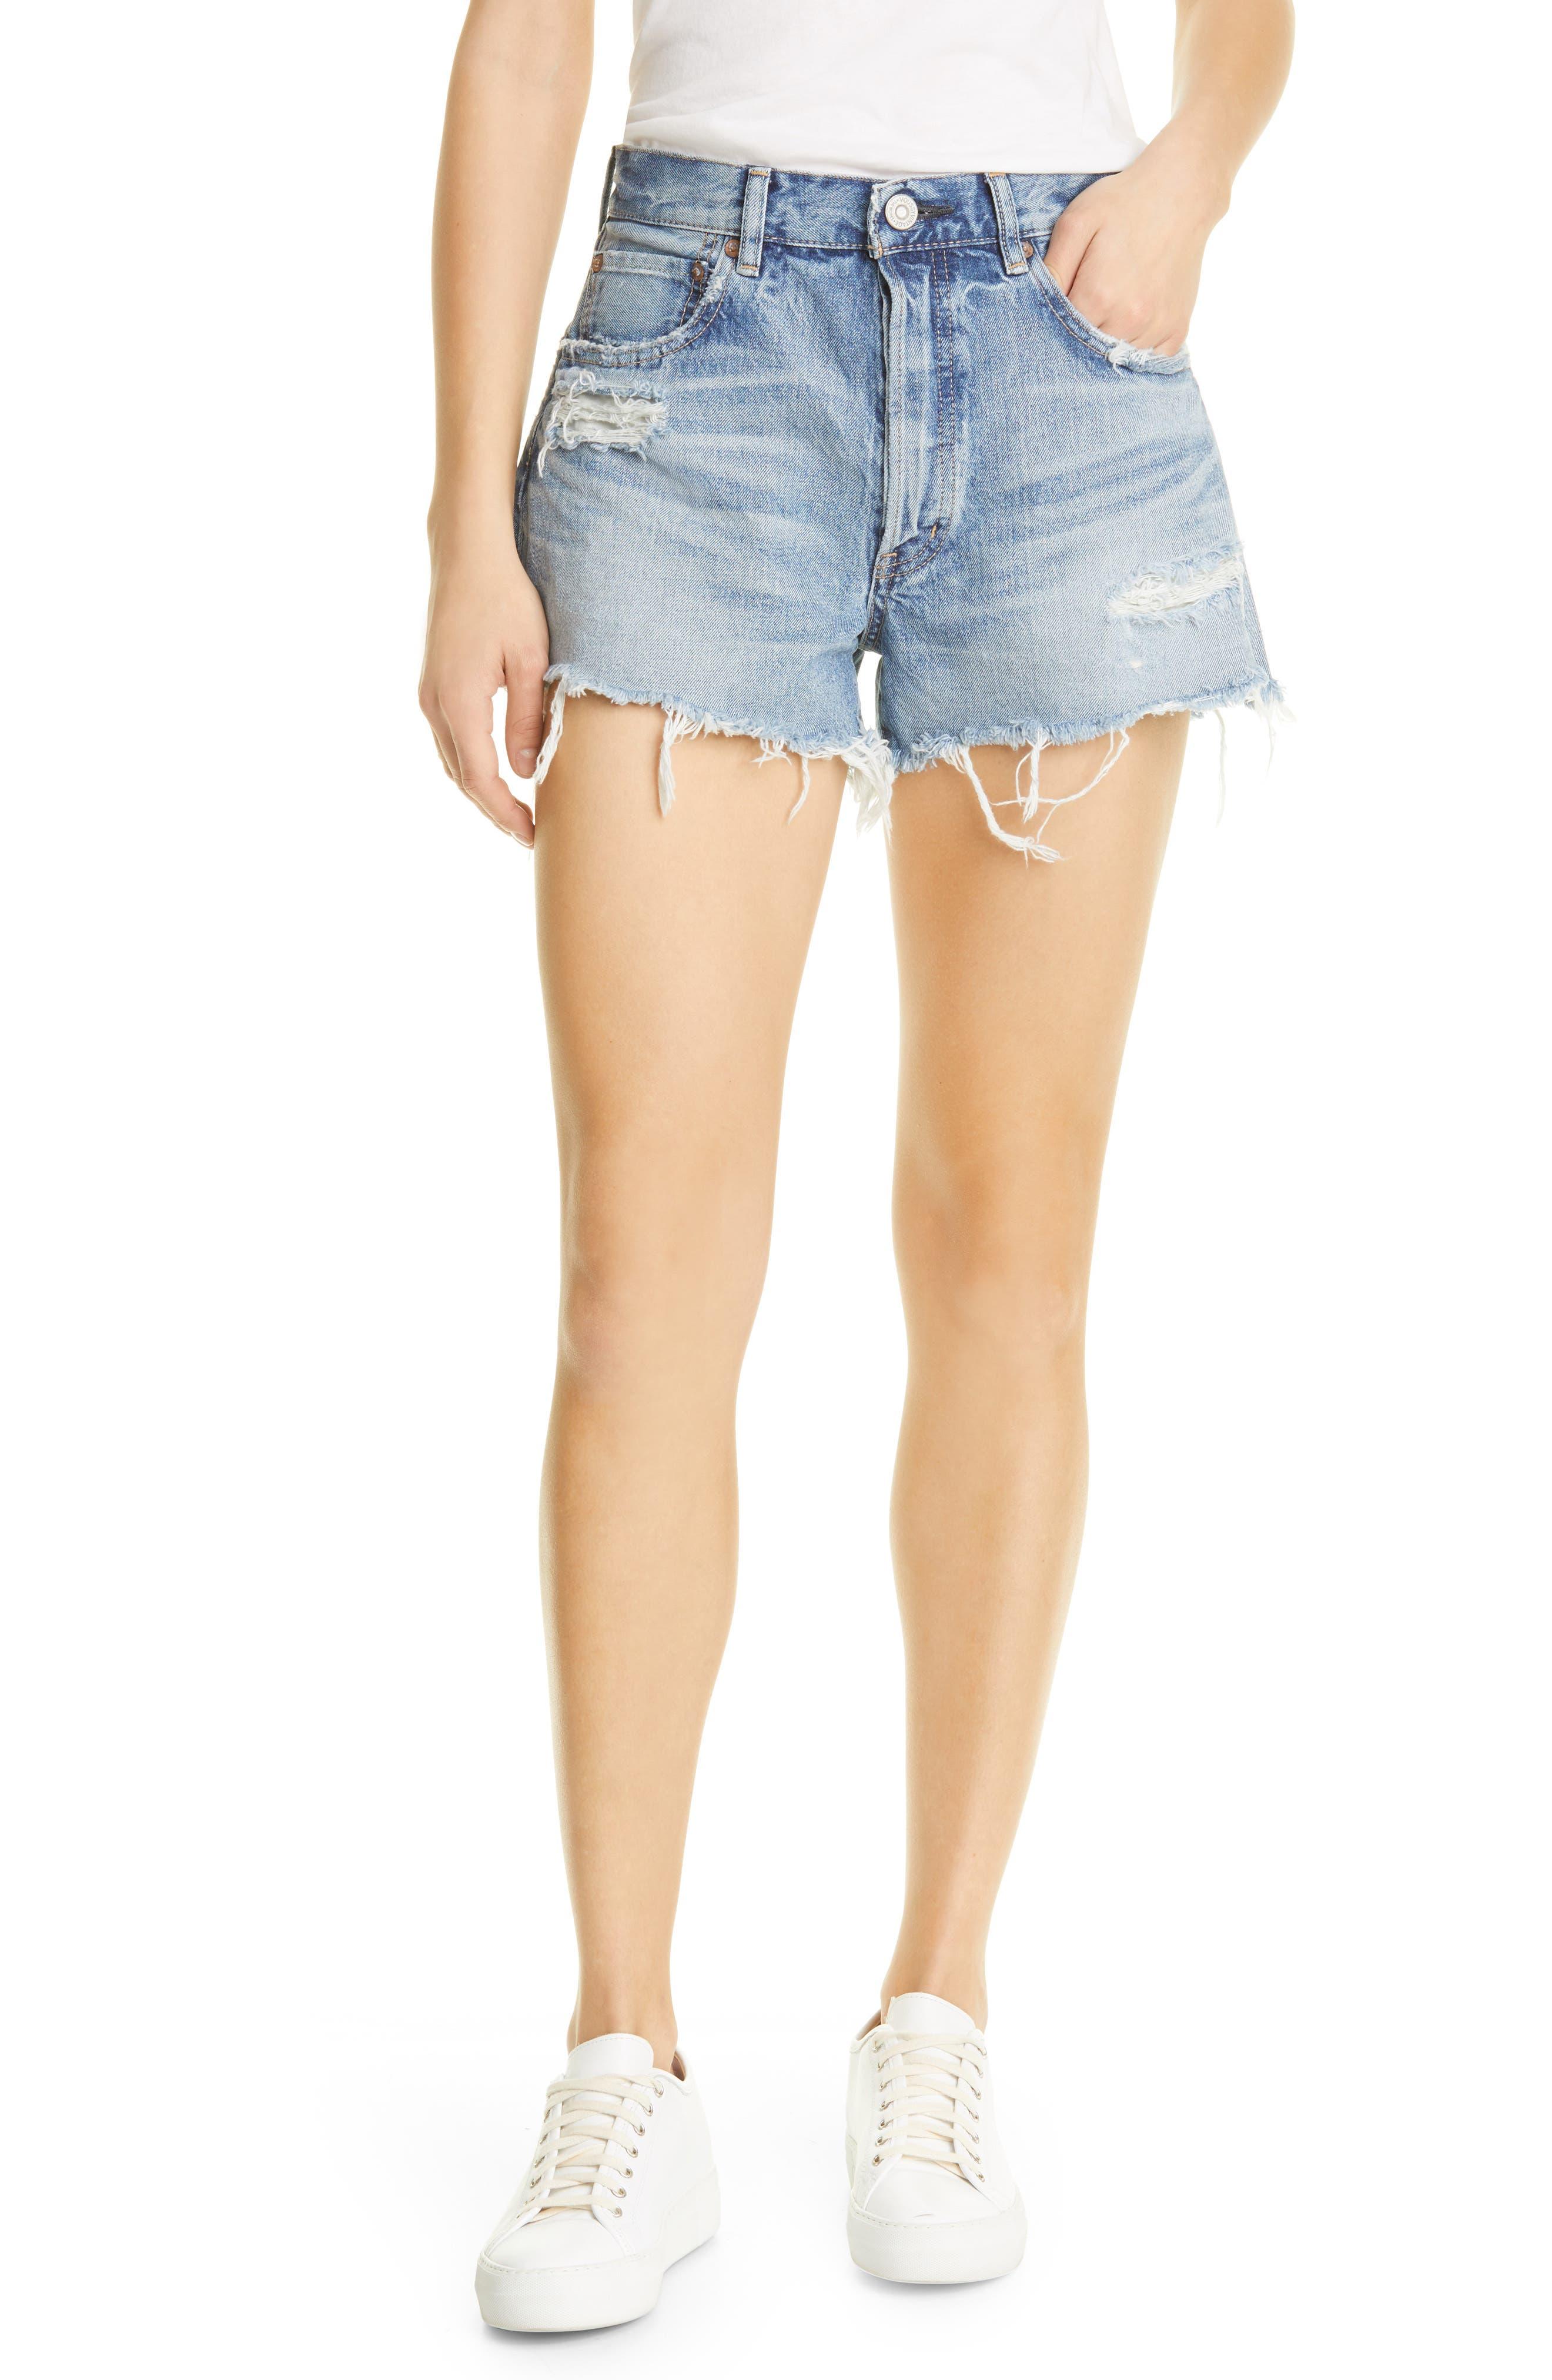 Mv Packard Ripped Cutoff Denim Shorts